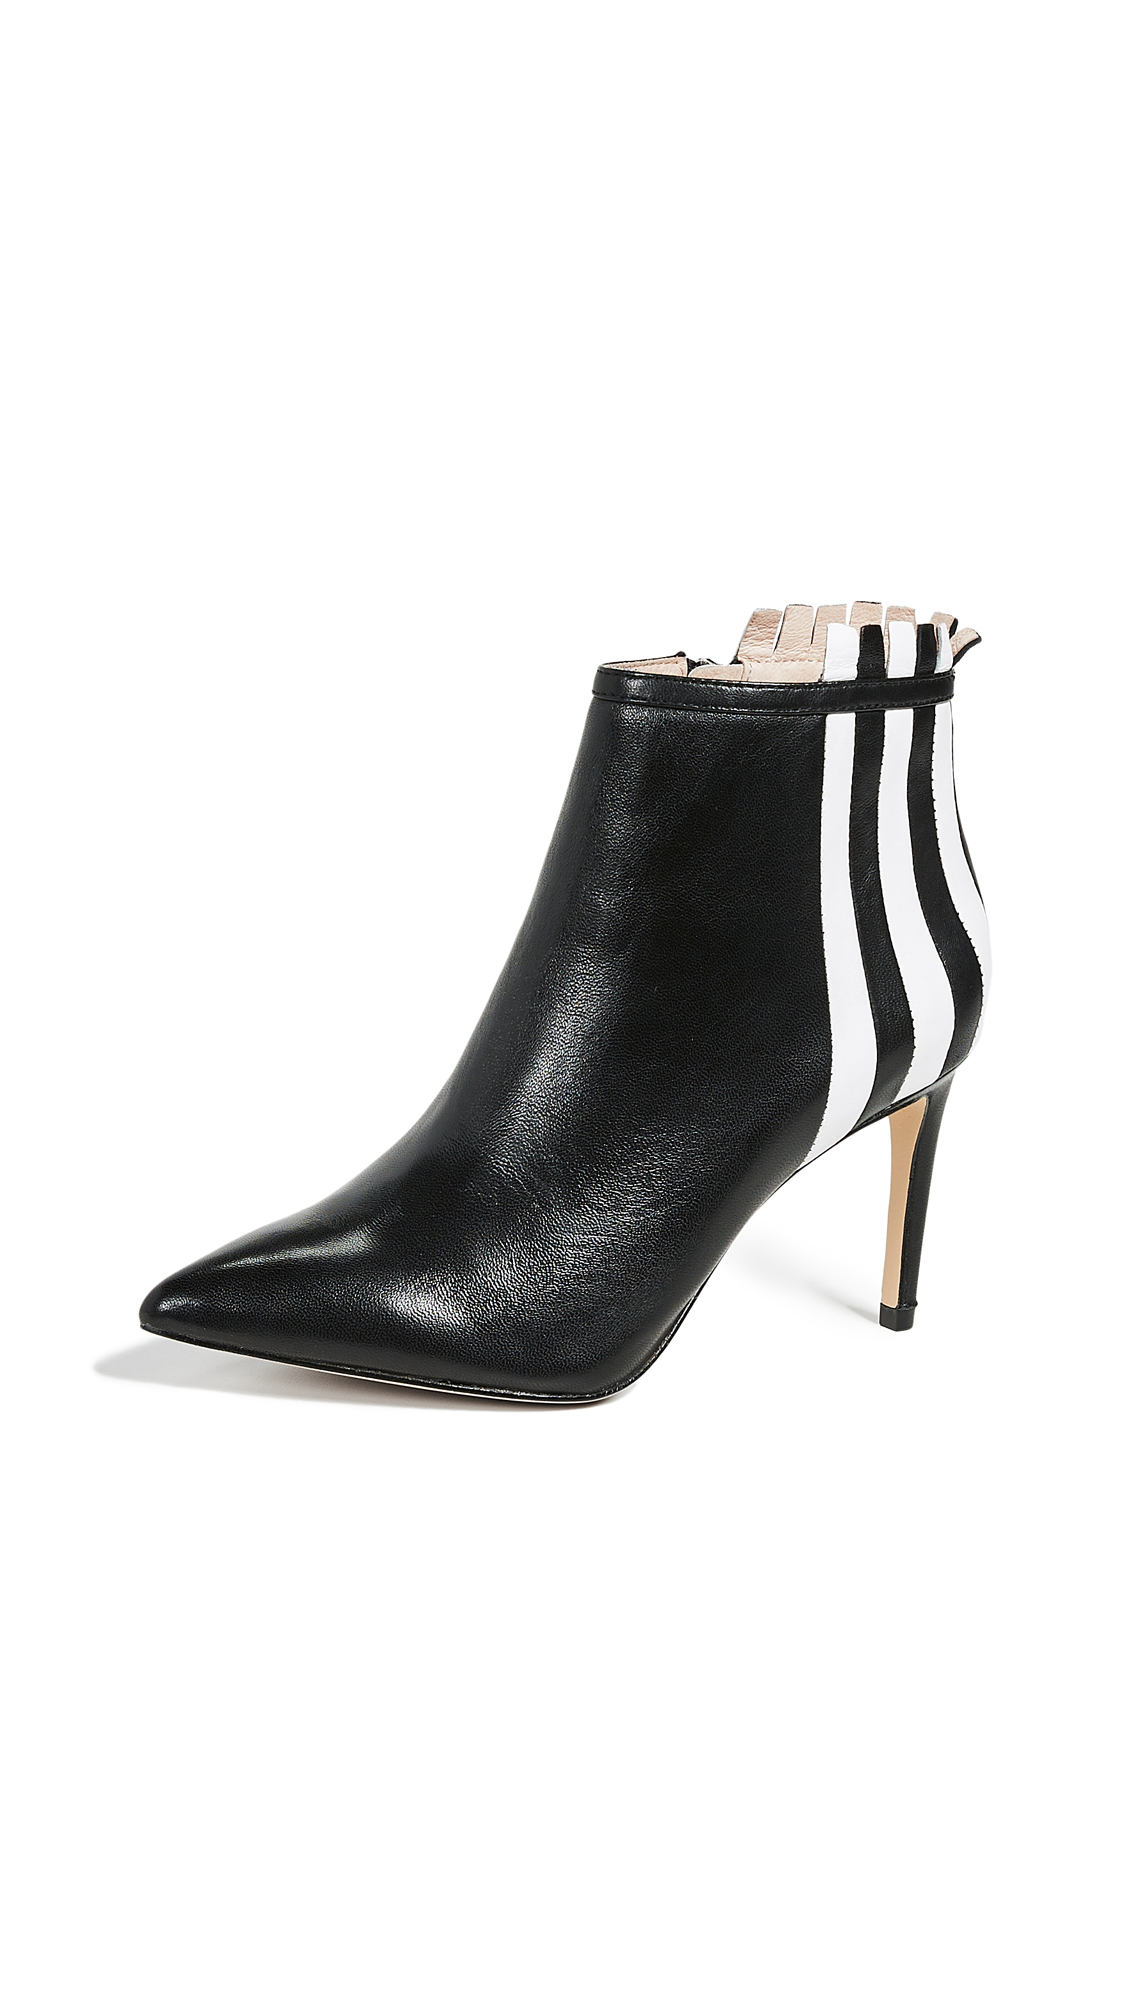 Rachel Zoe Taylor Stripe Ankle Boots - Black/White